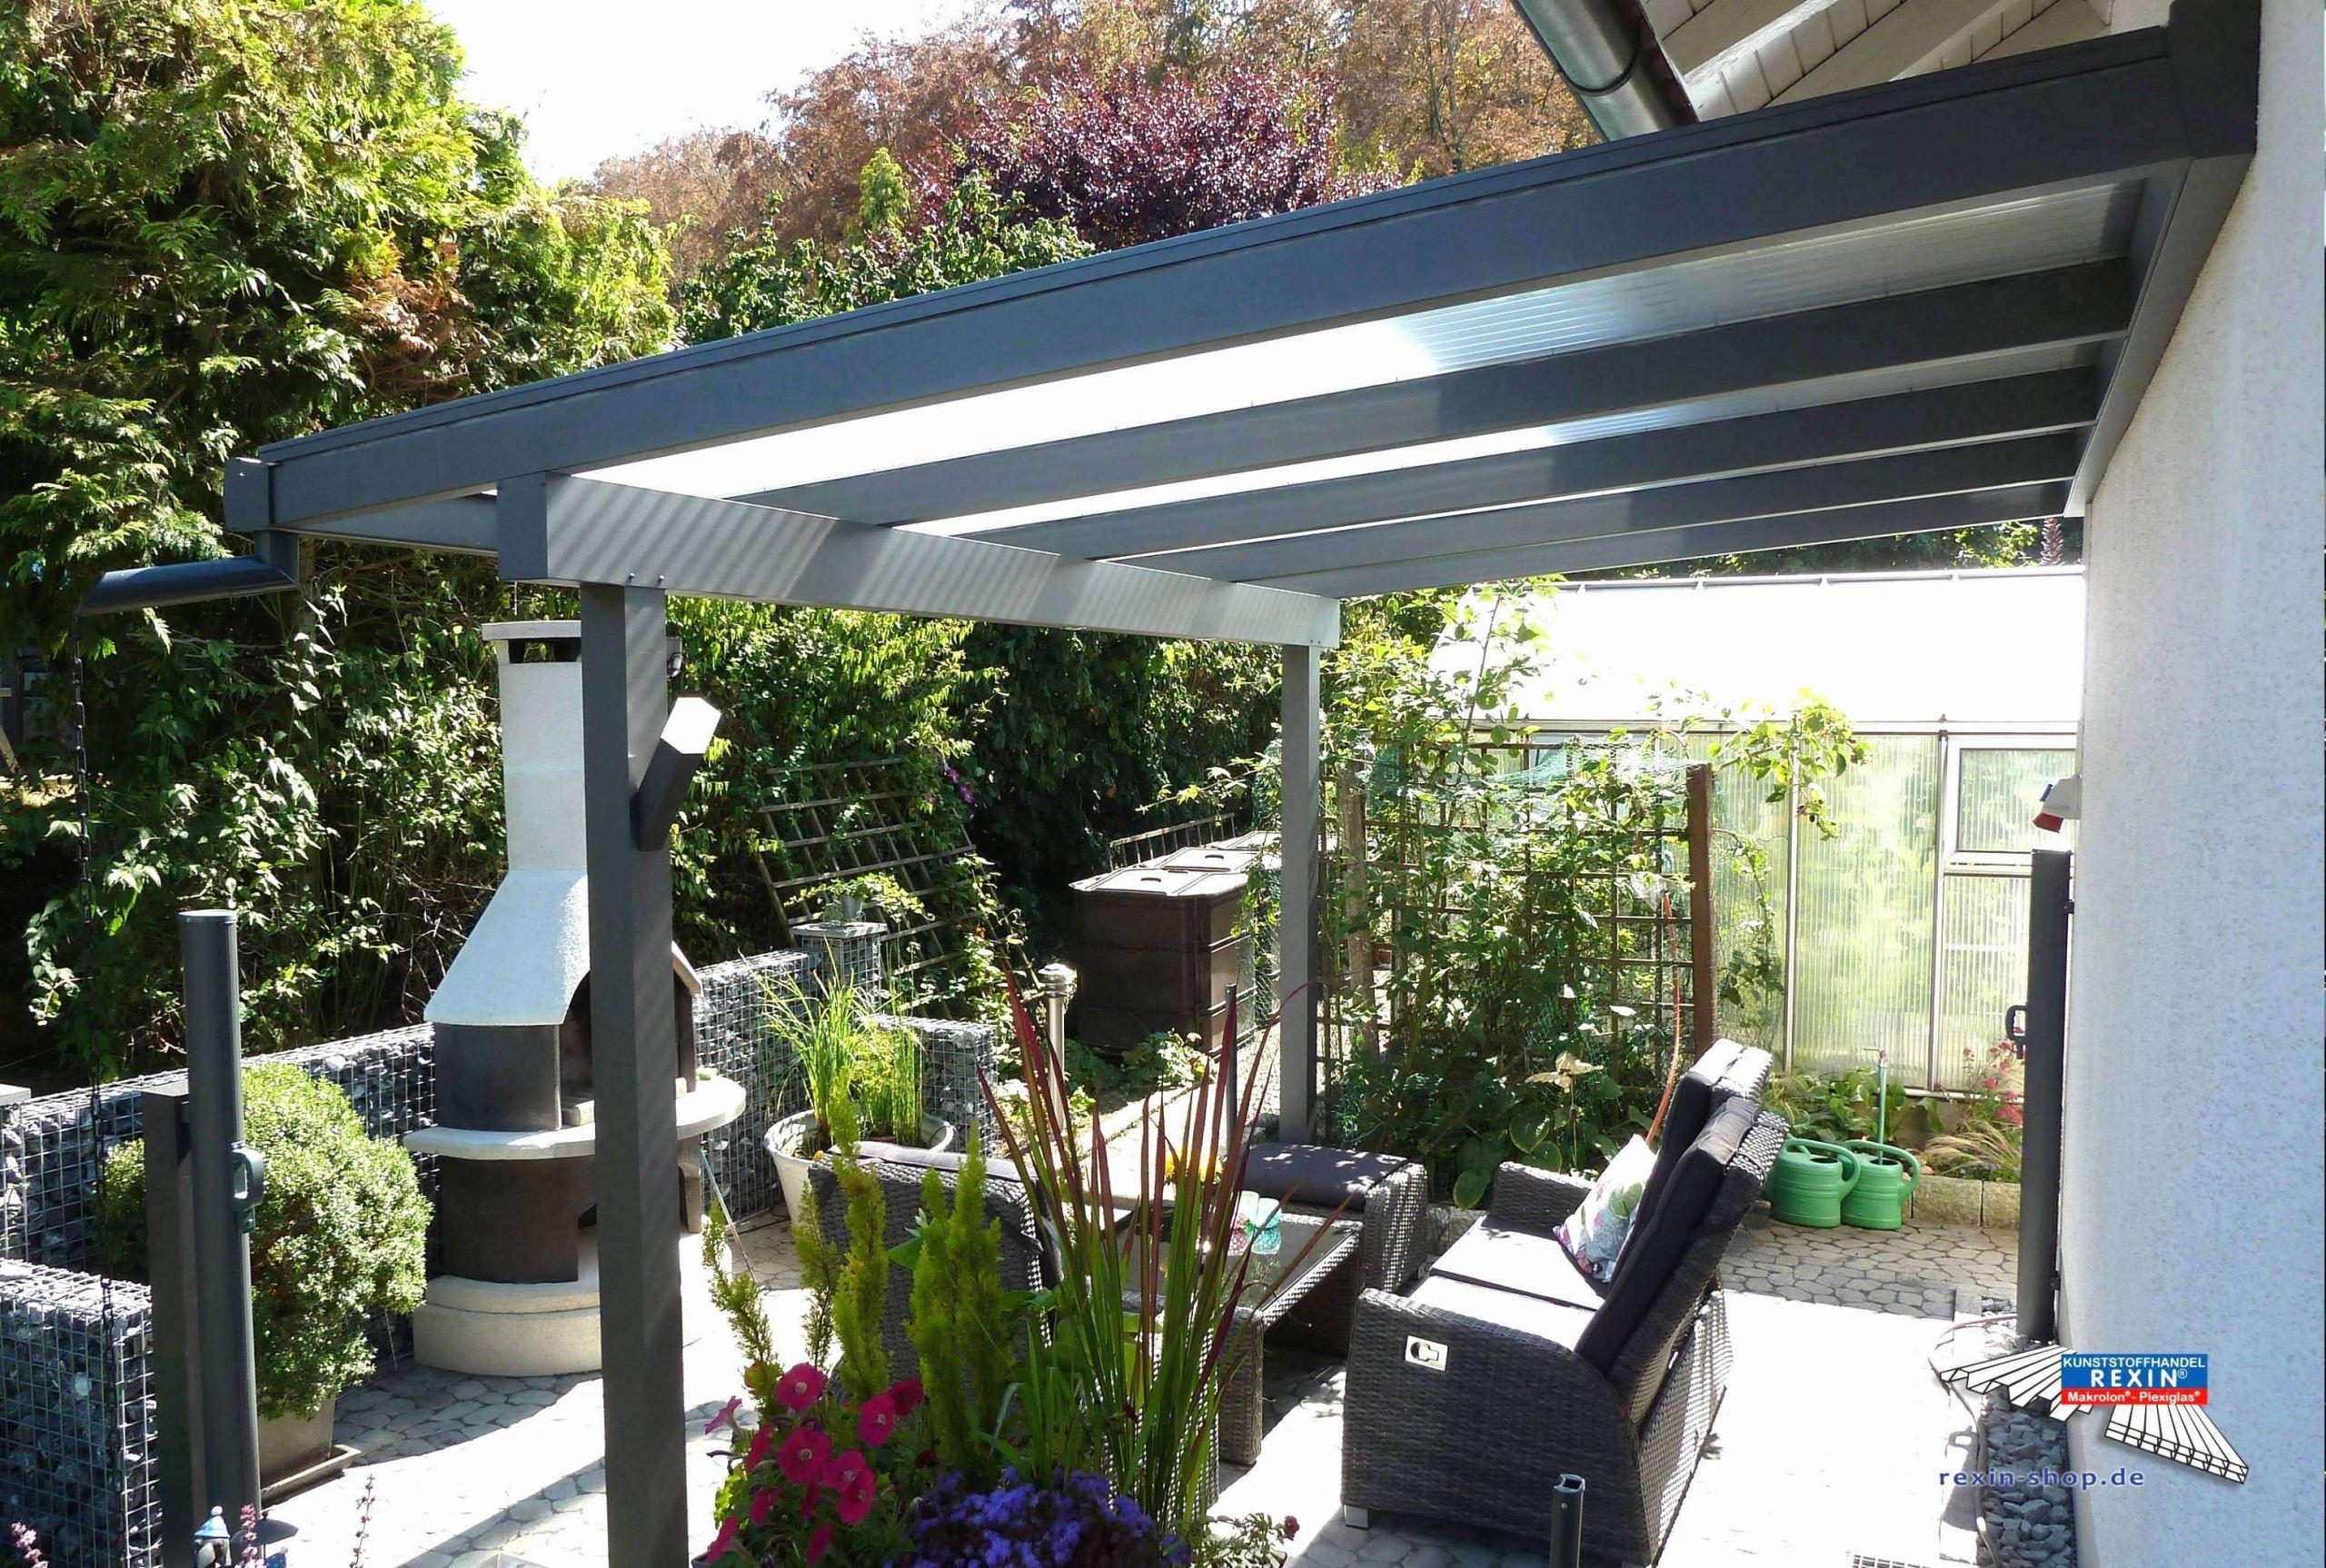 29 Reizend Garten Modern Luxus Garten Anlegen